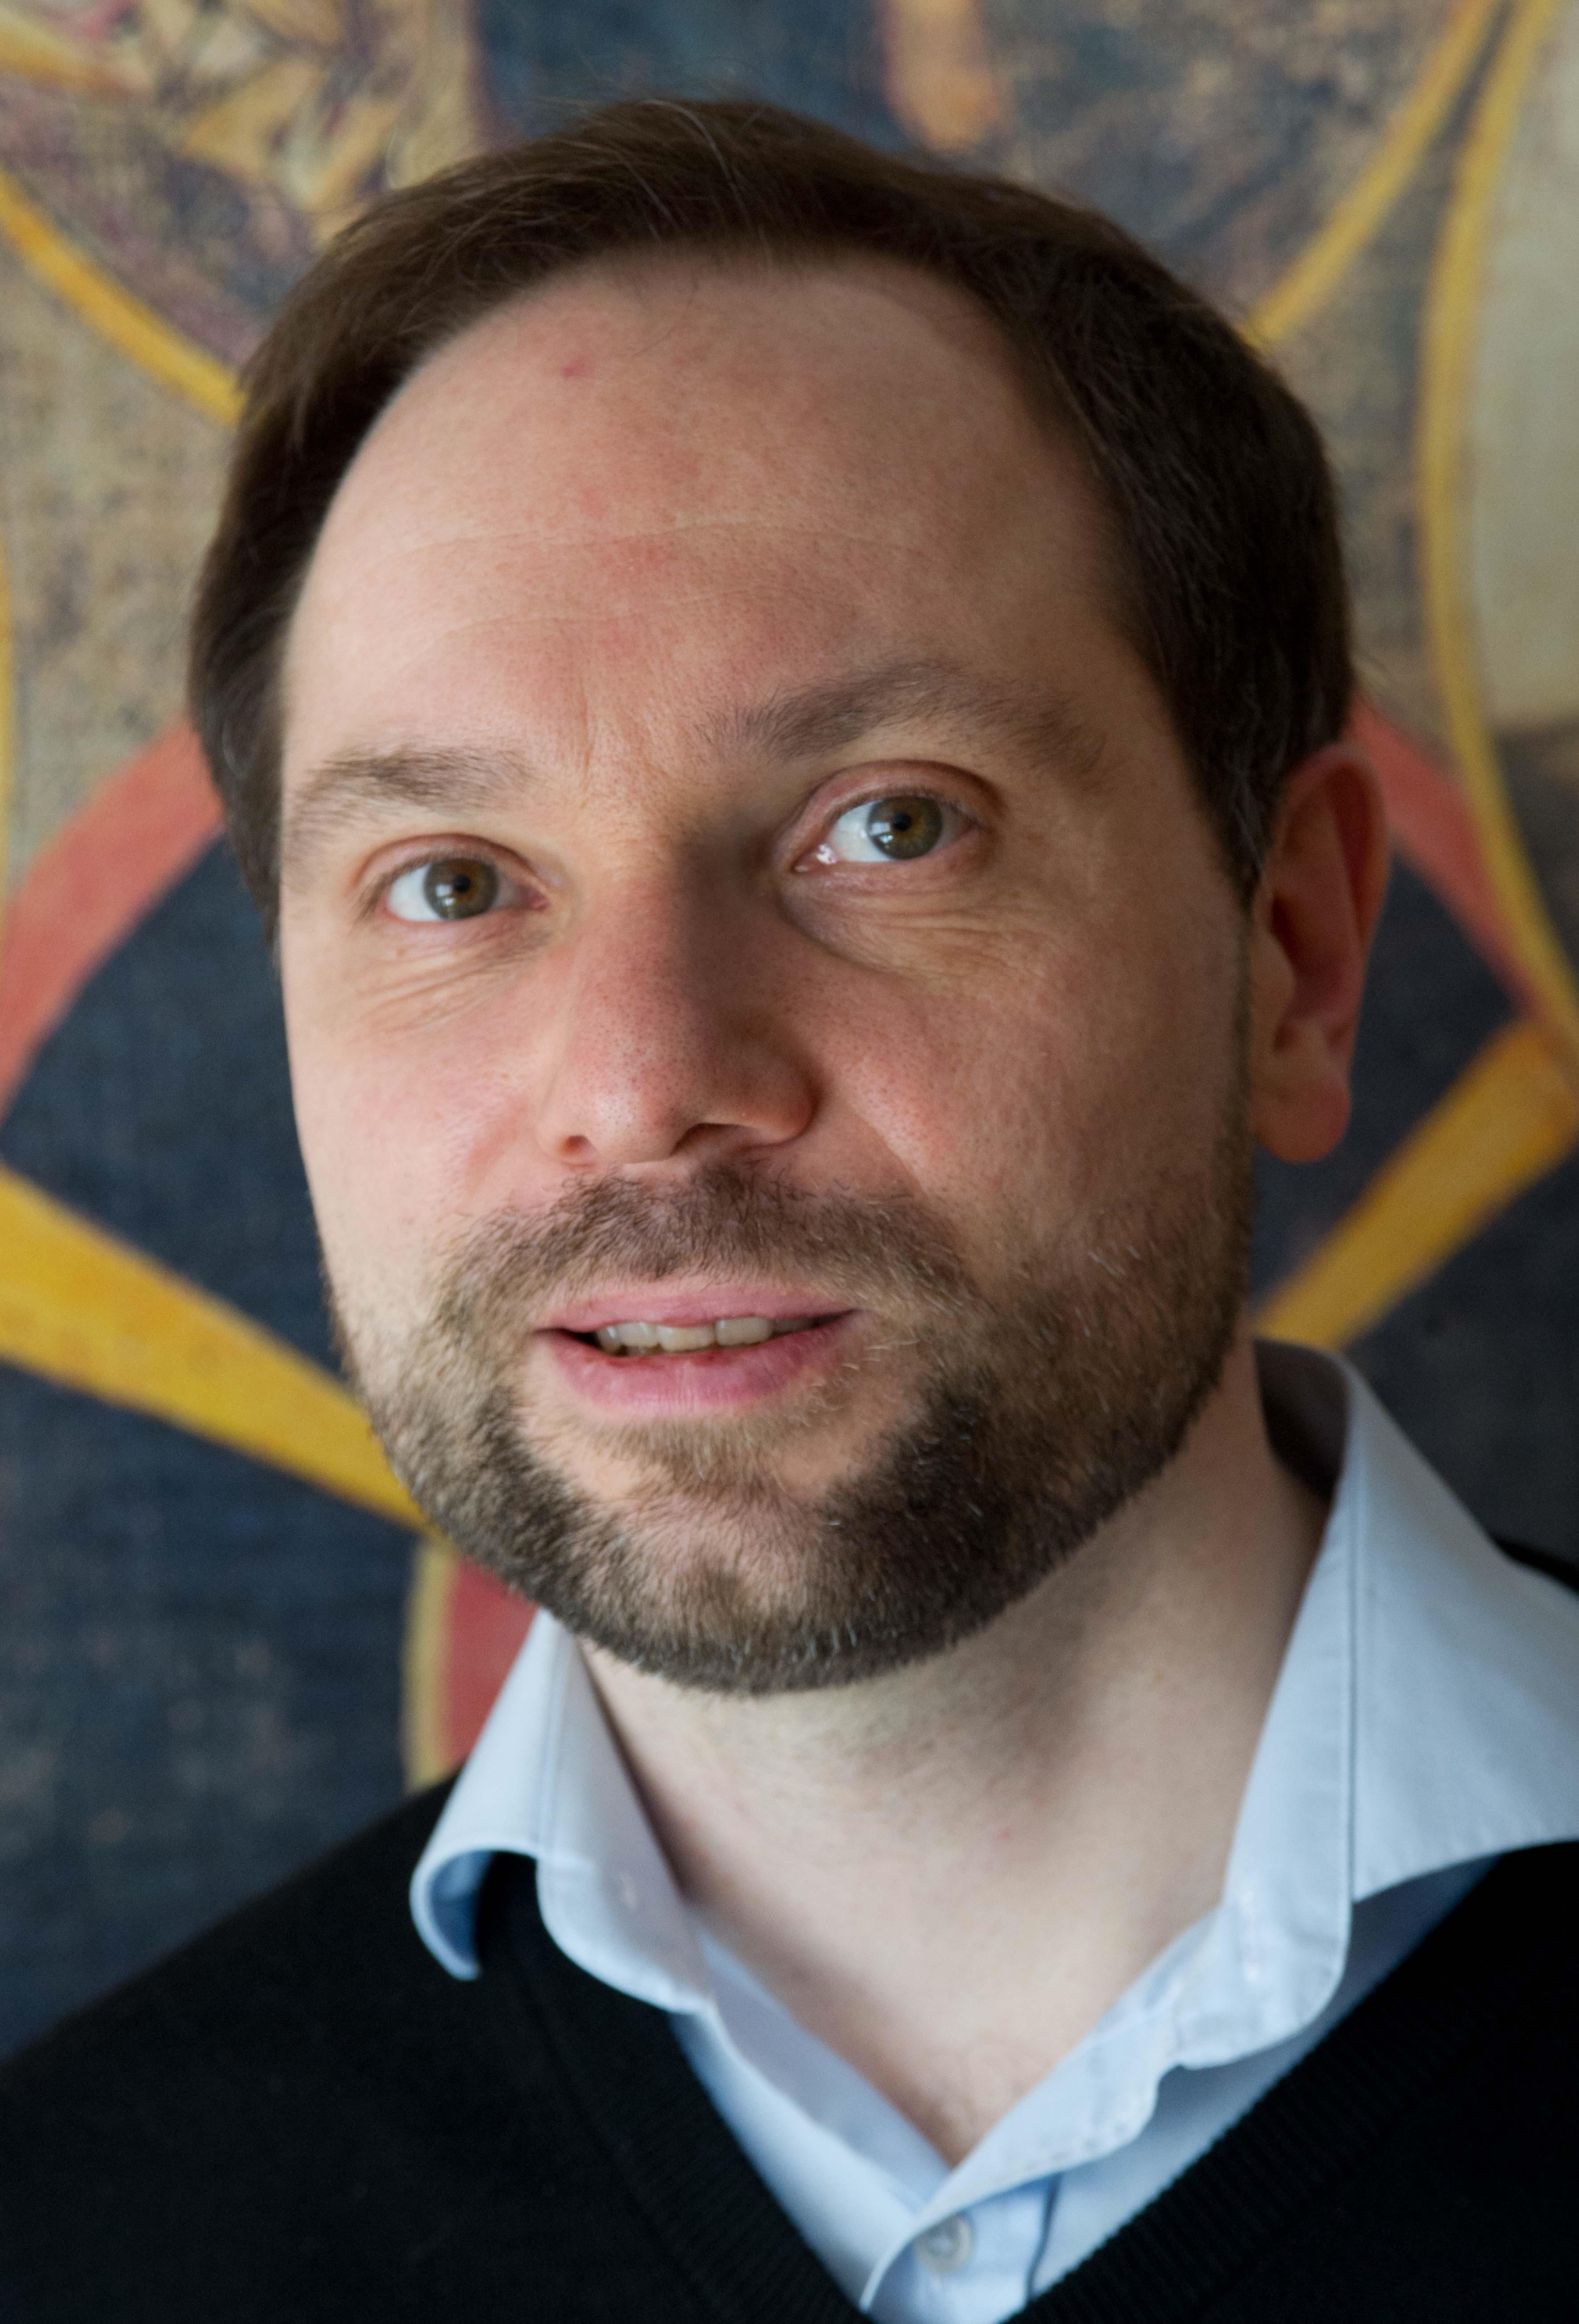 Pfarrvikar Alexander Haas